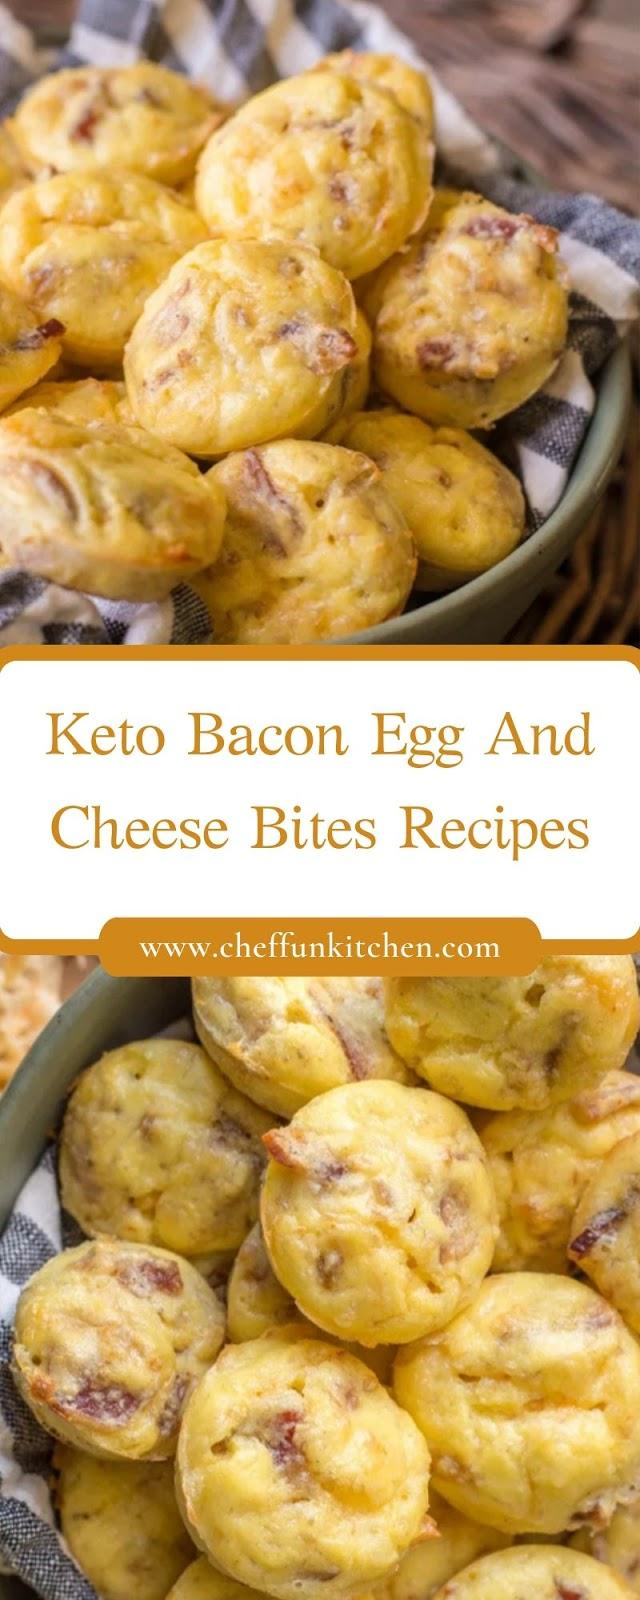 Keto Bacon Egg And Cheese Bites Recipes